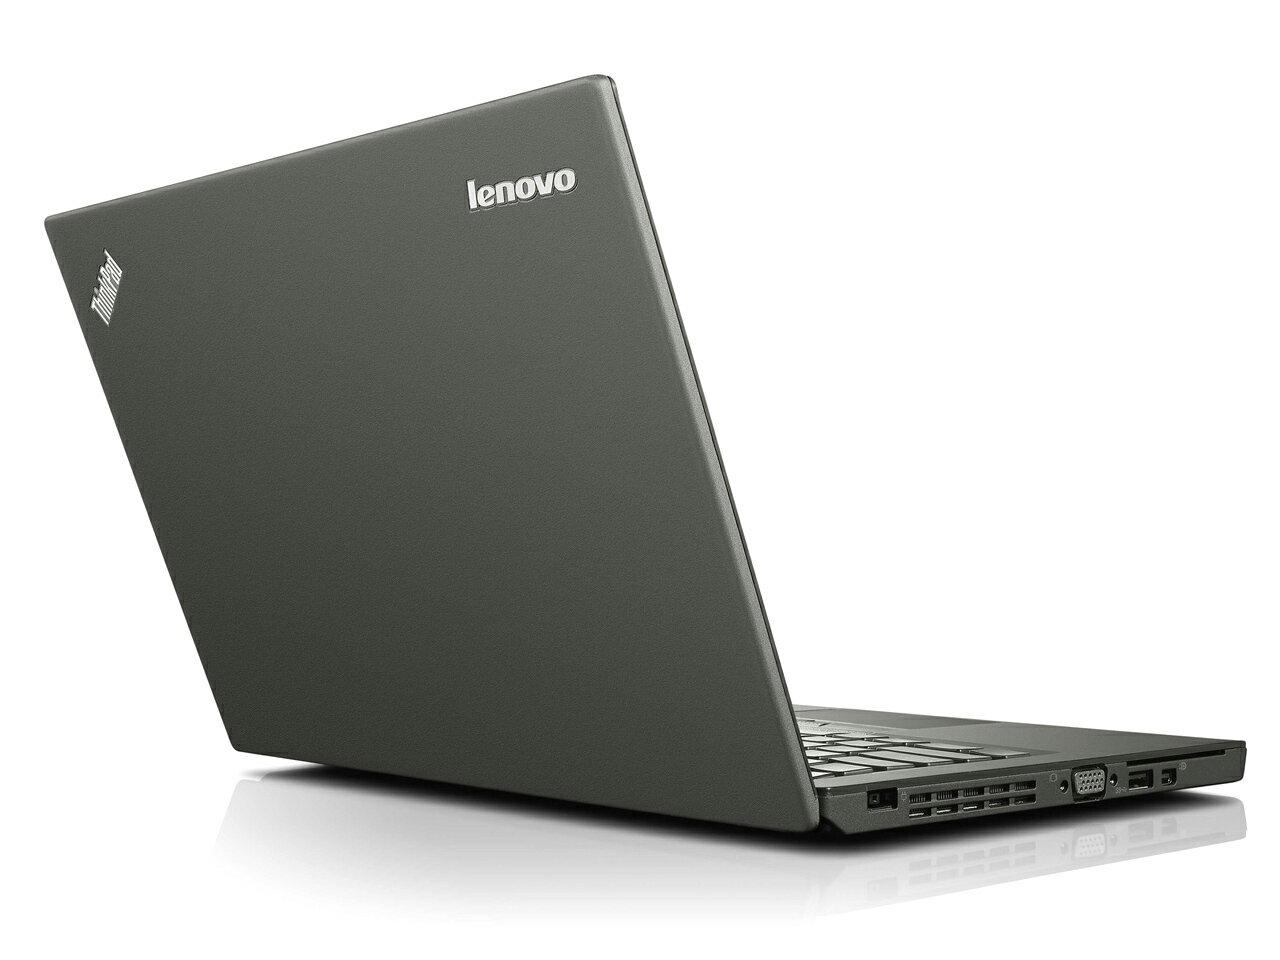 Lenovo X250 i5 8G RAM 240G SSD 12 5